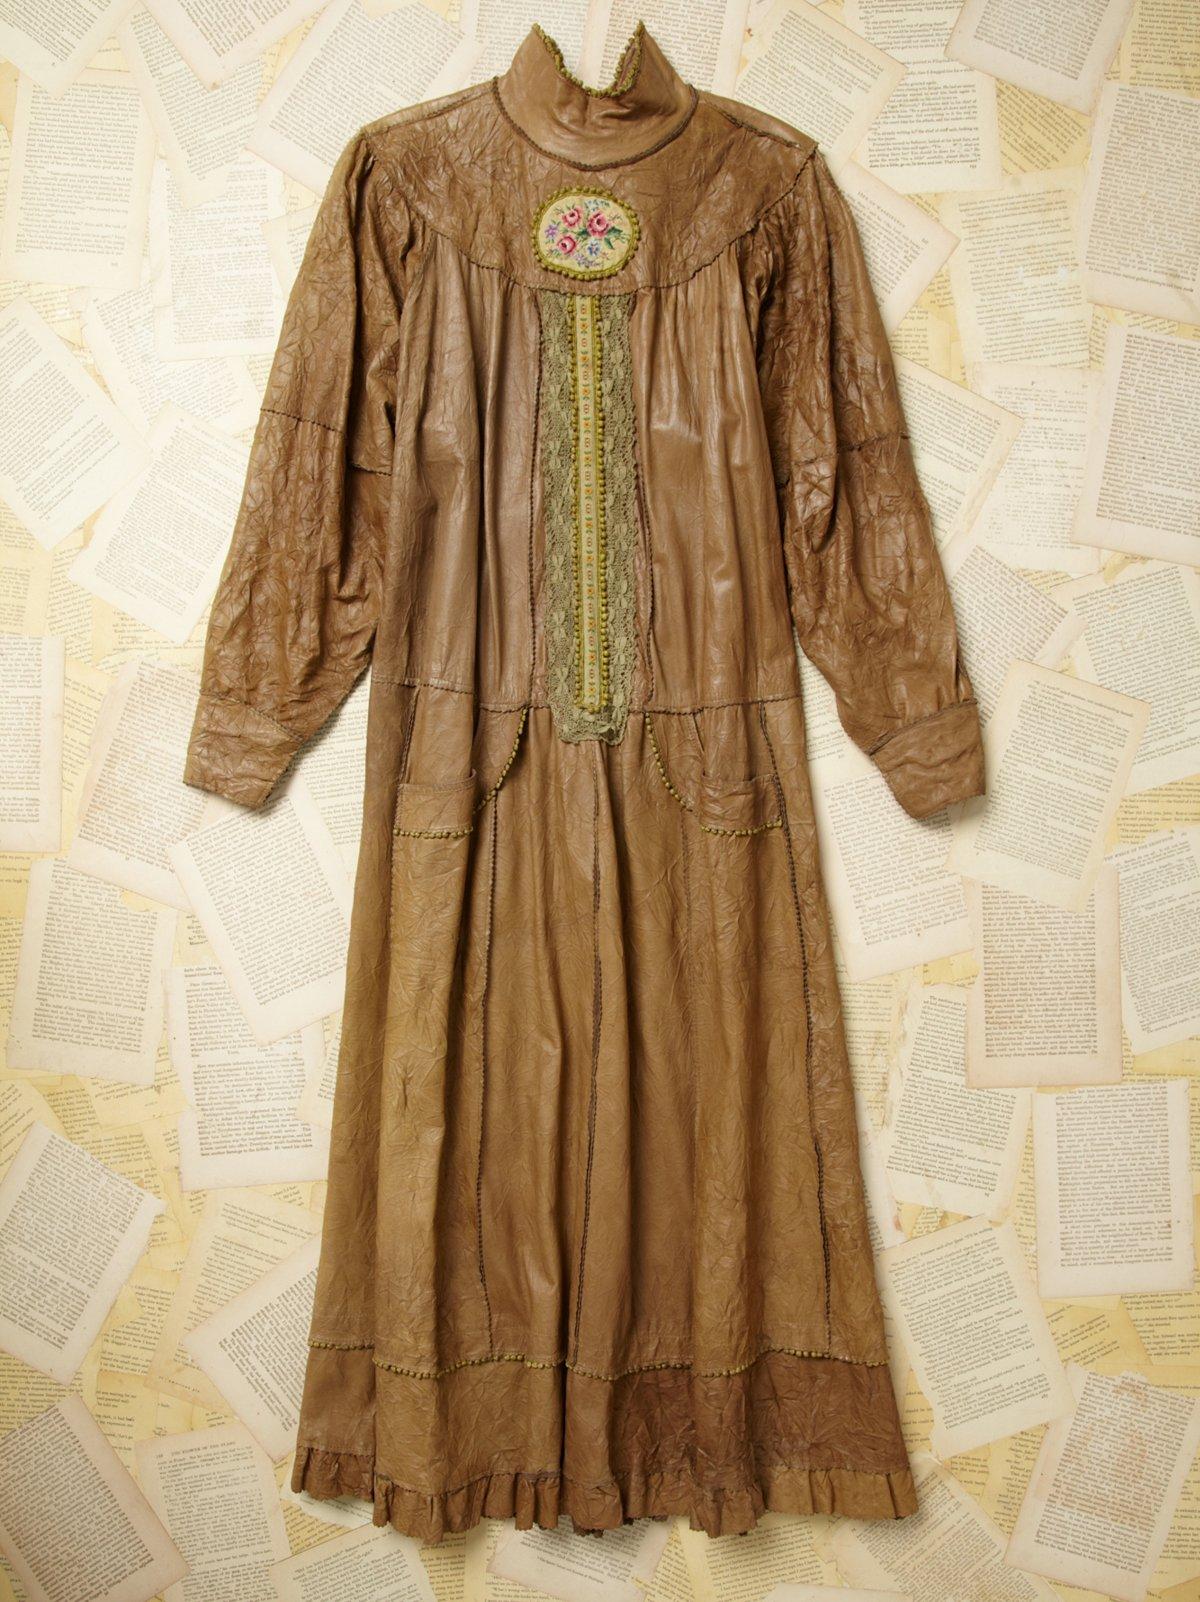 Vintage Embroidered Leather Dress